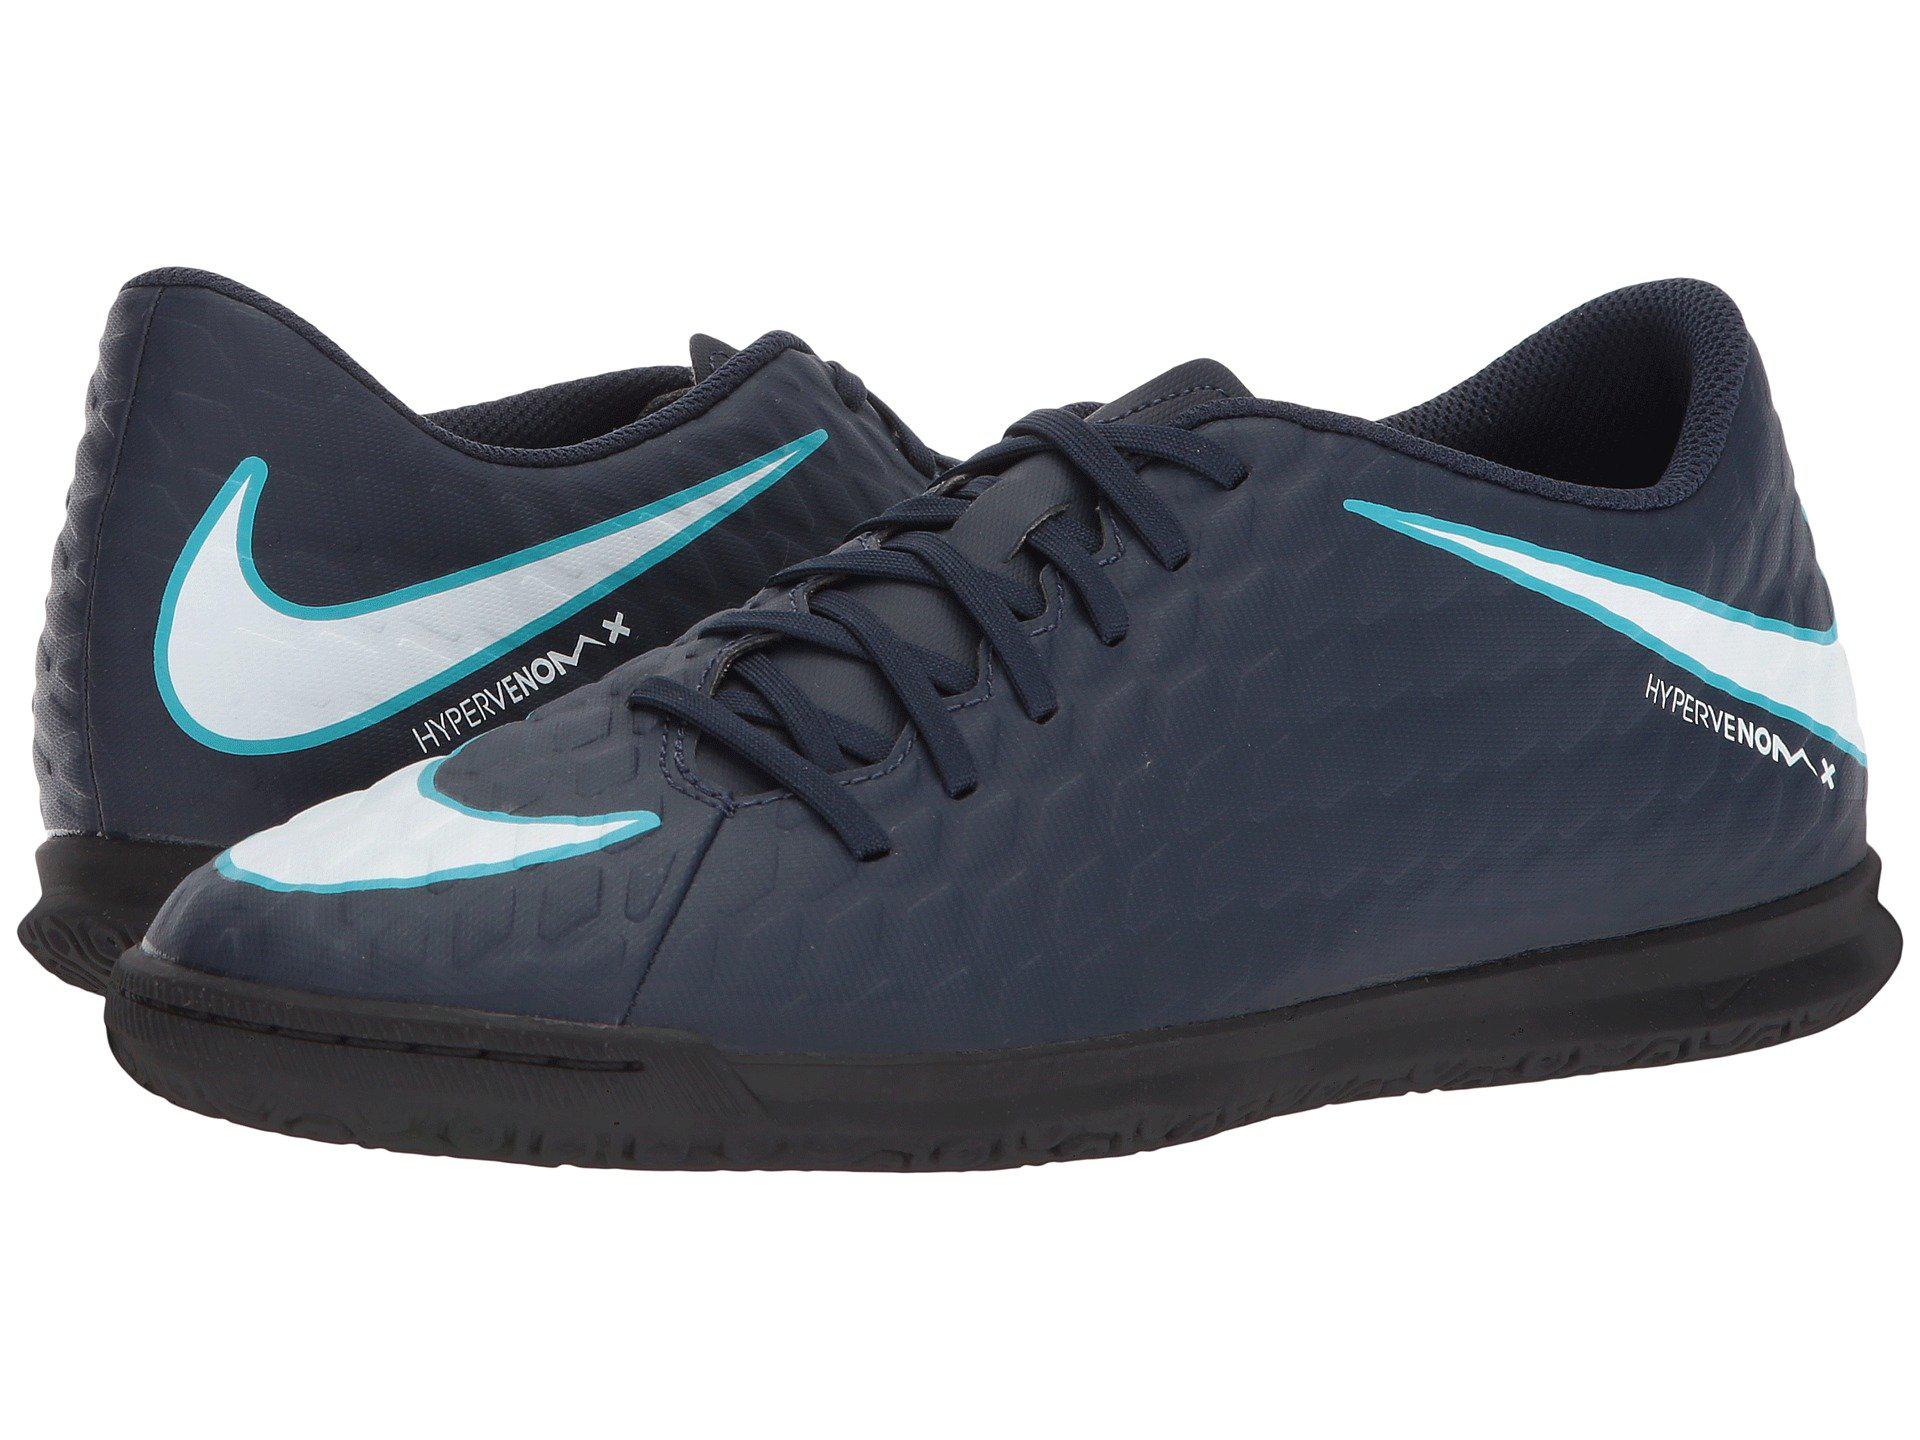 Nike Hypervenom Phade Iii Ic In Obsidian/white/gamma Blue/glacier Blue